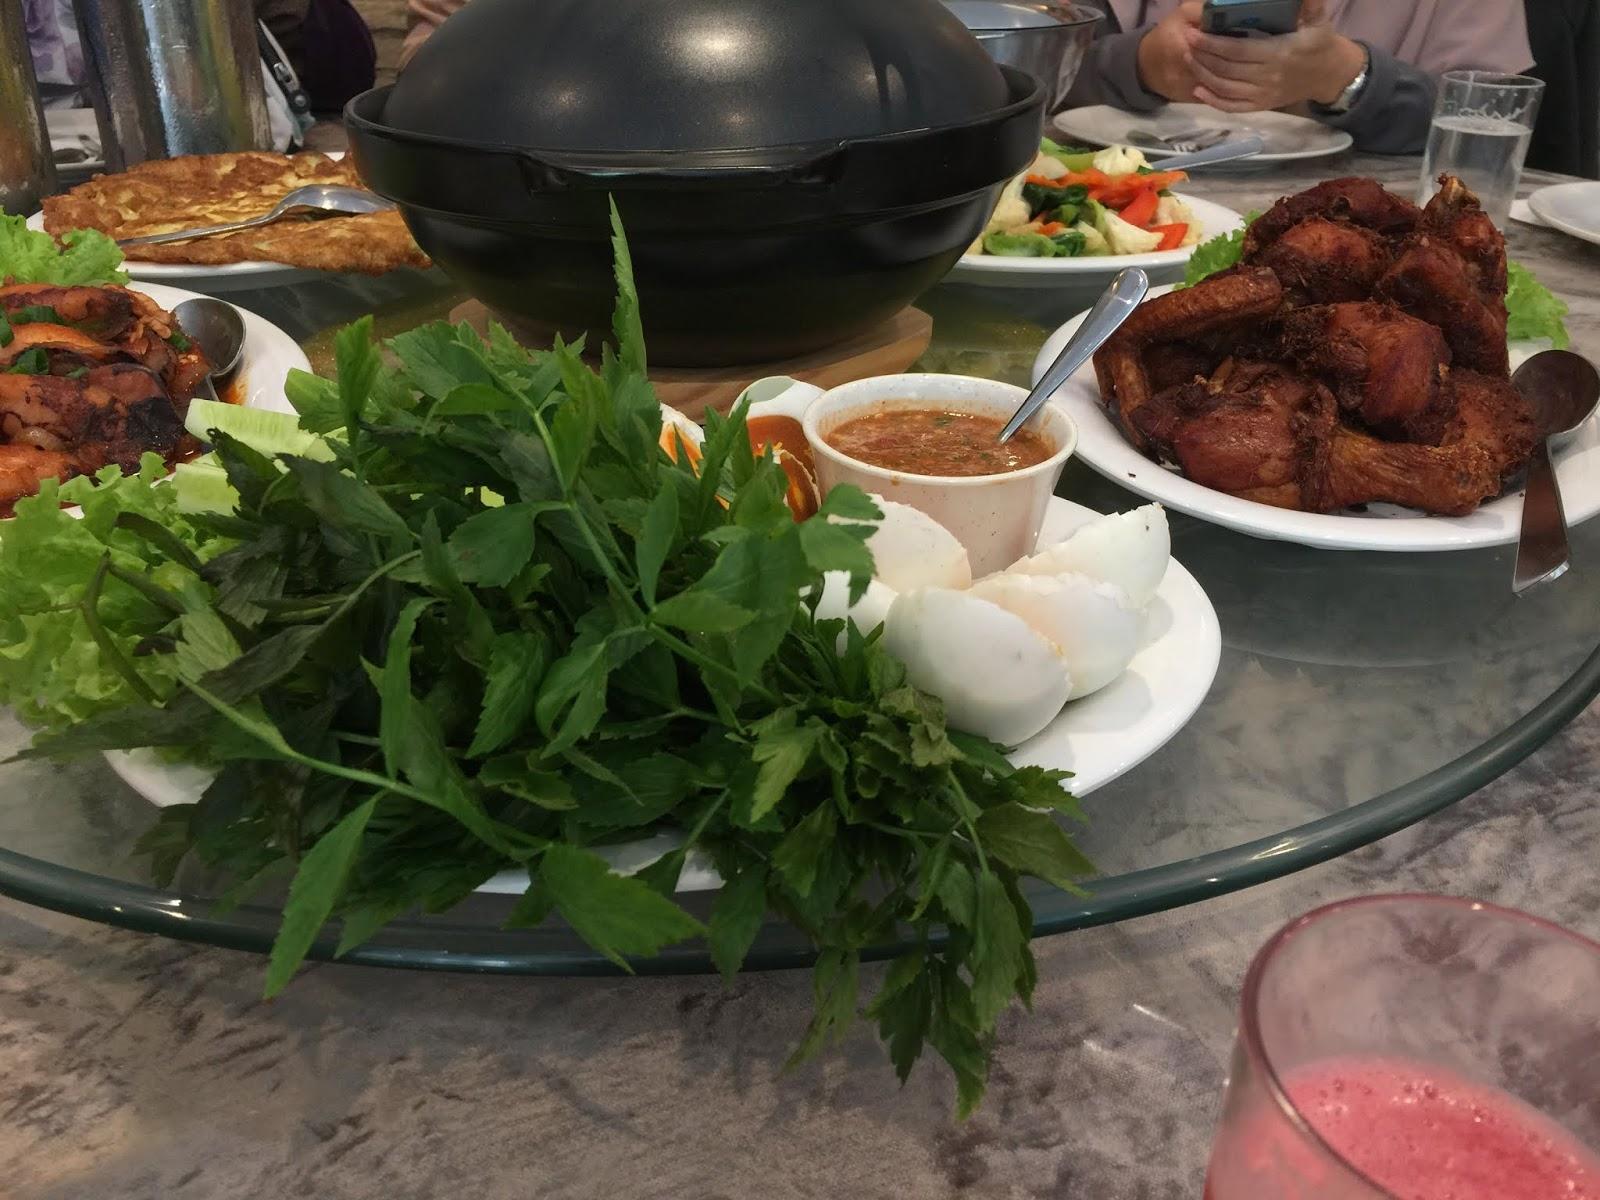 restoran de pauh, tempat makan di pulau pinang, pilihan menu menarik untuk makan, menu makan tengahari